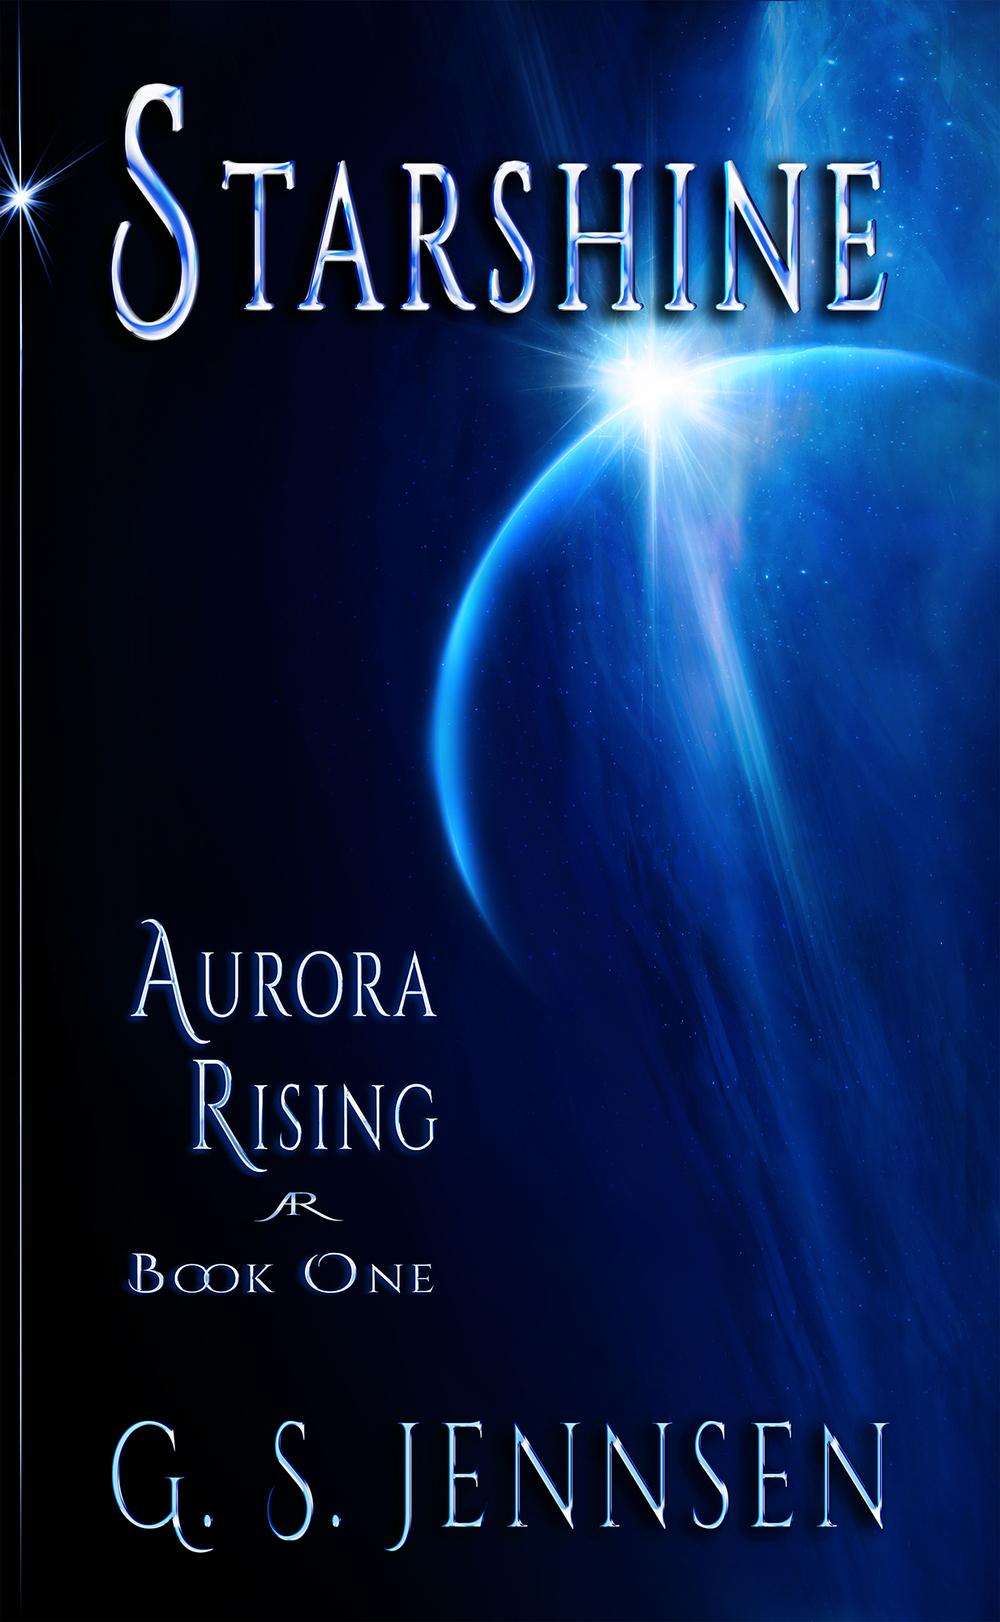 ORIGINAL STARSHINE  COVER   Nebula Stock: [link]   Brushes used: [link] , [link] , [link] , [link] , [link] , [link] and [link]